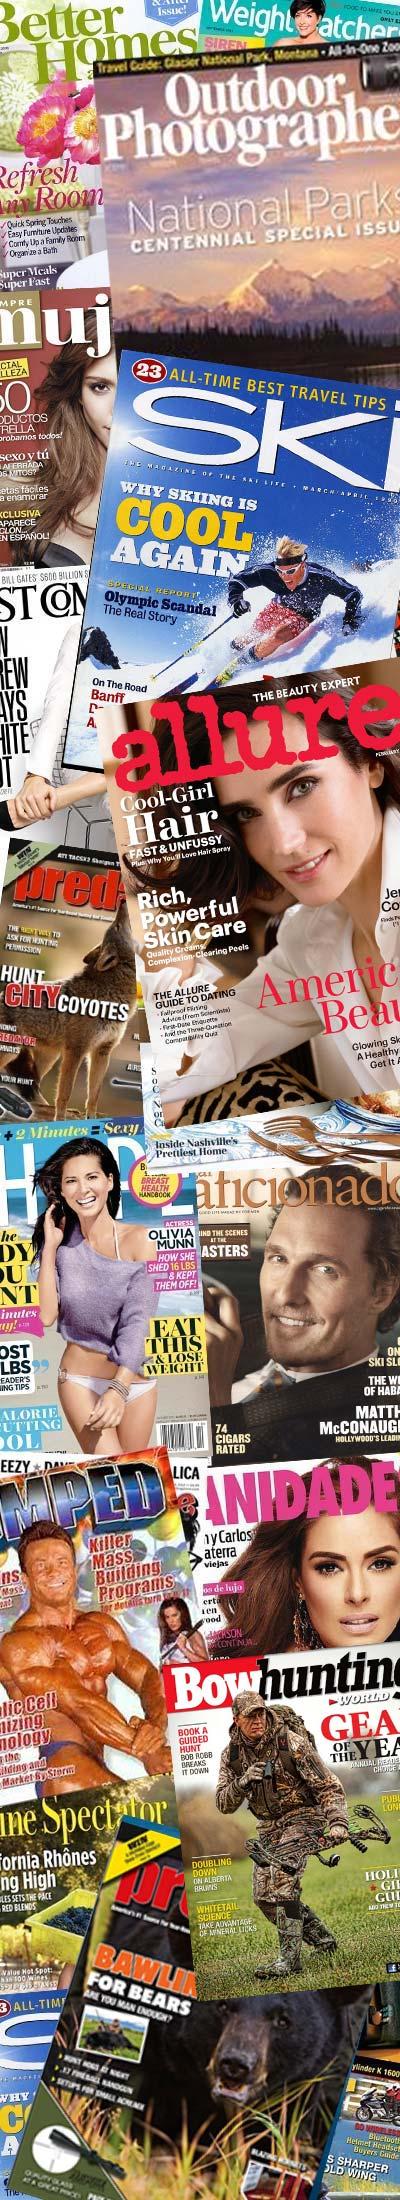 31 FREE Magazines Today